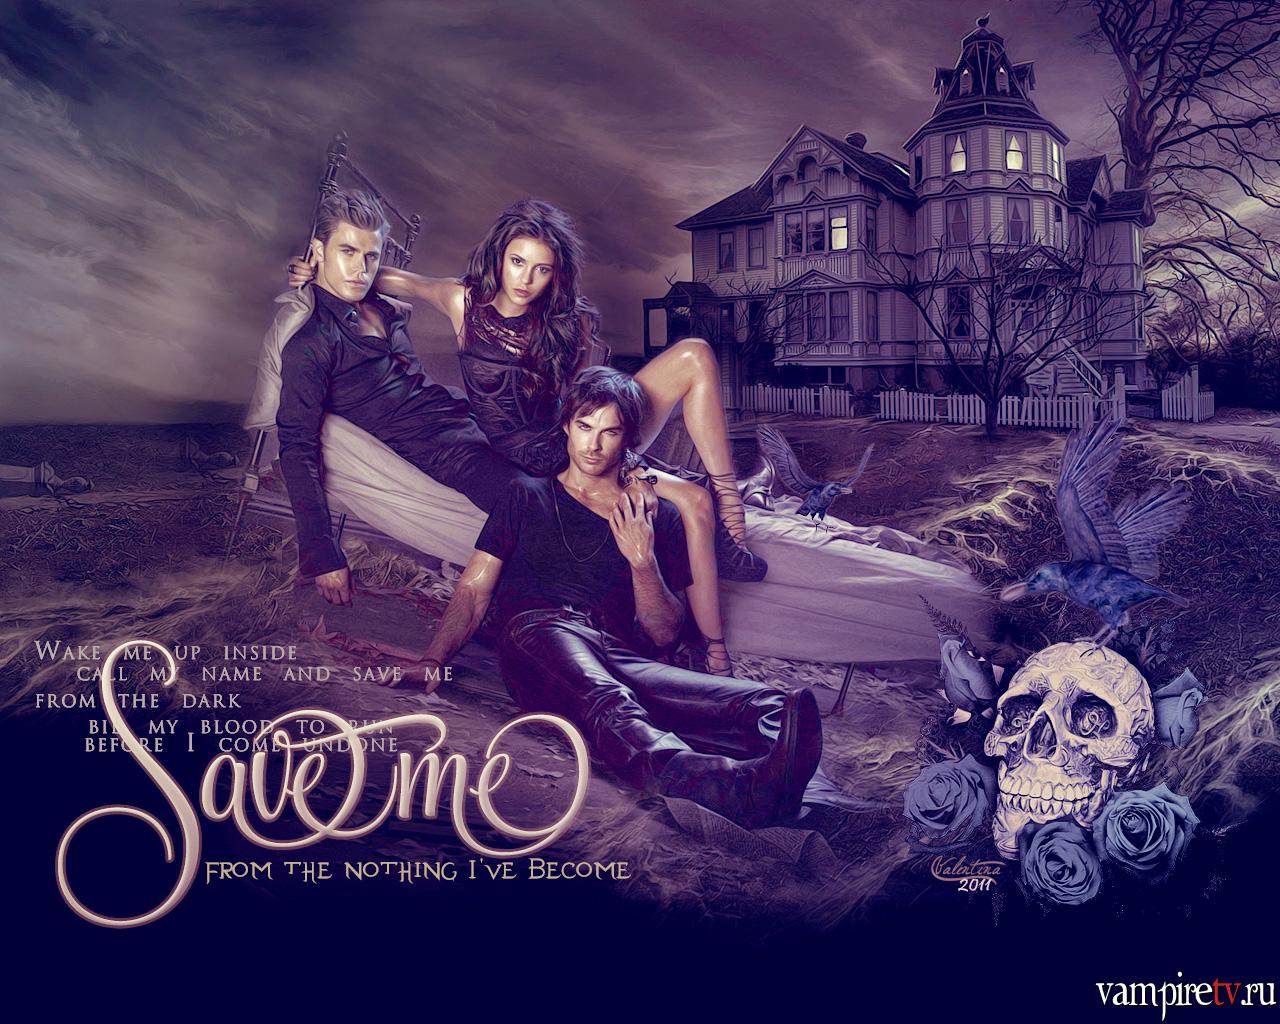 Вампиров >>> Обои для рабочего стола ...: vampiretv.ru/photo/wgallery_view.php?gallery=wallpapers&page=1&sort...